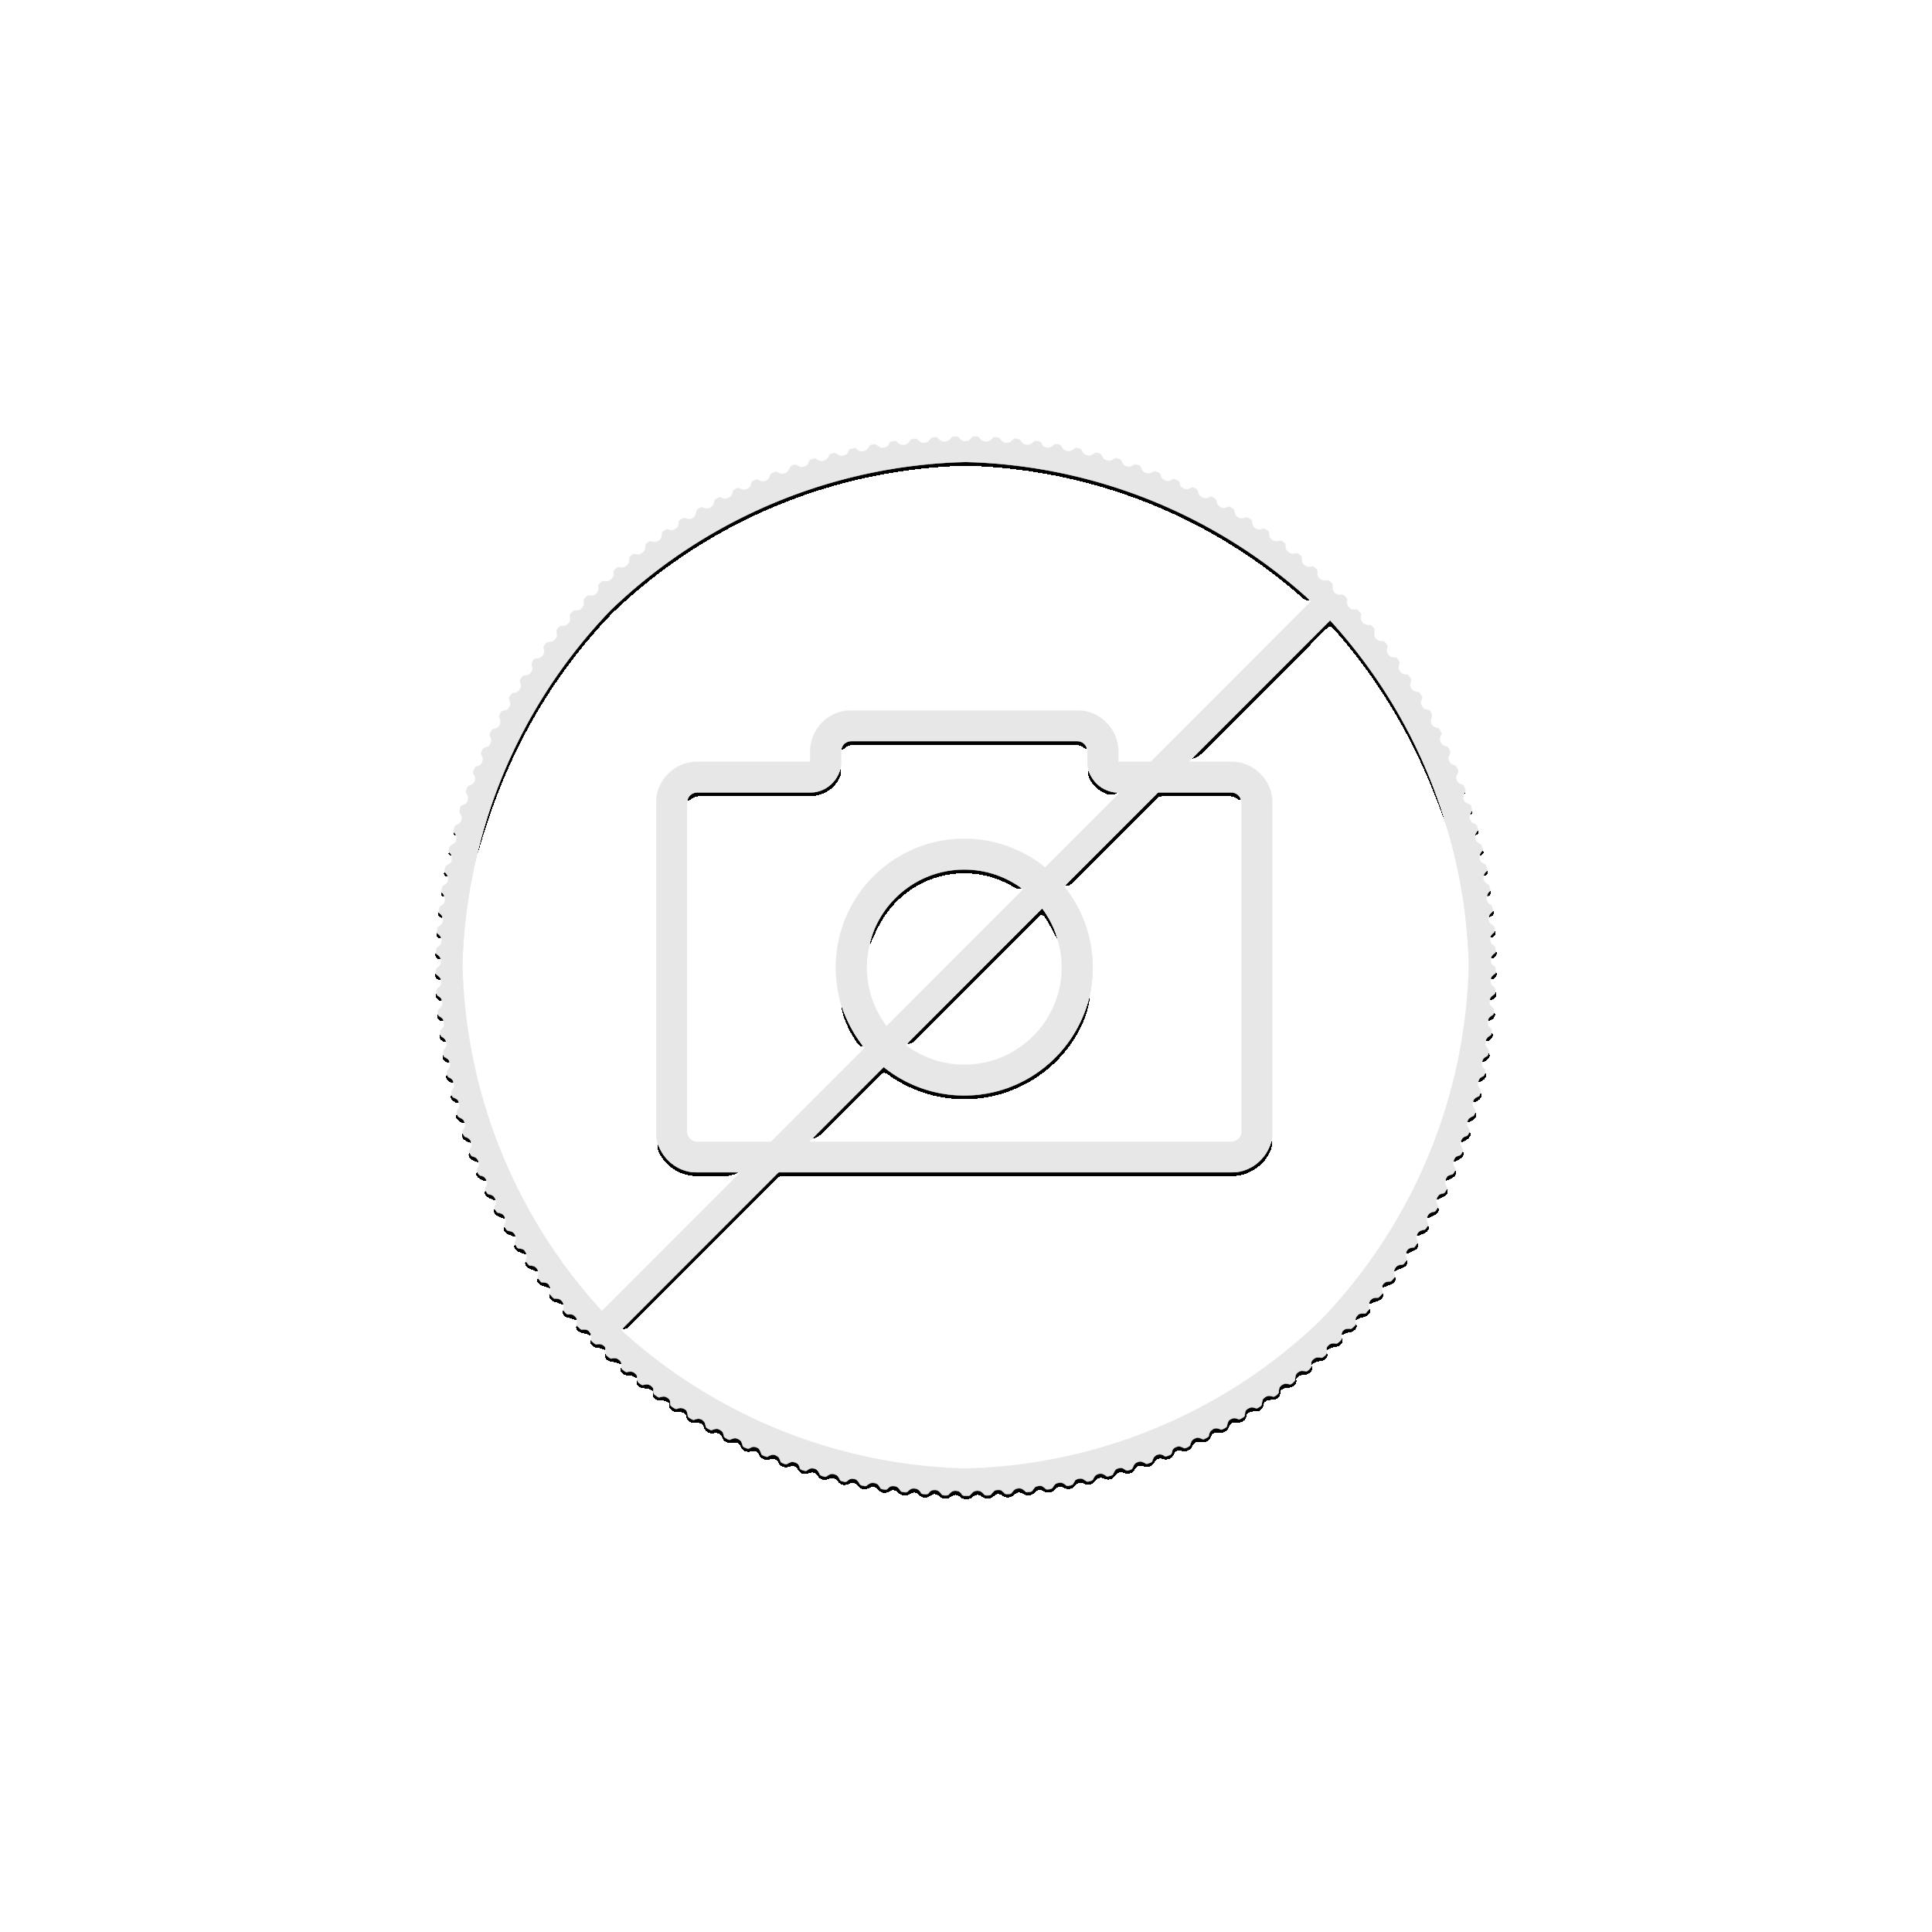 1 troy ounce zilveren munt dragon gekleurd 2021